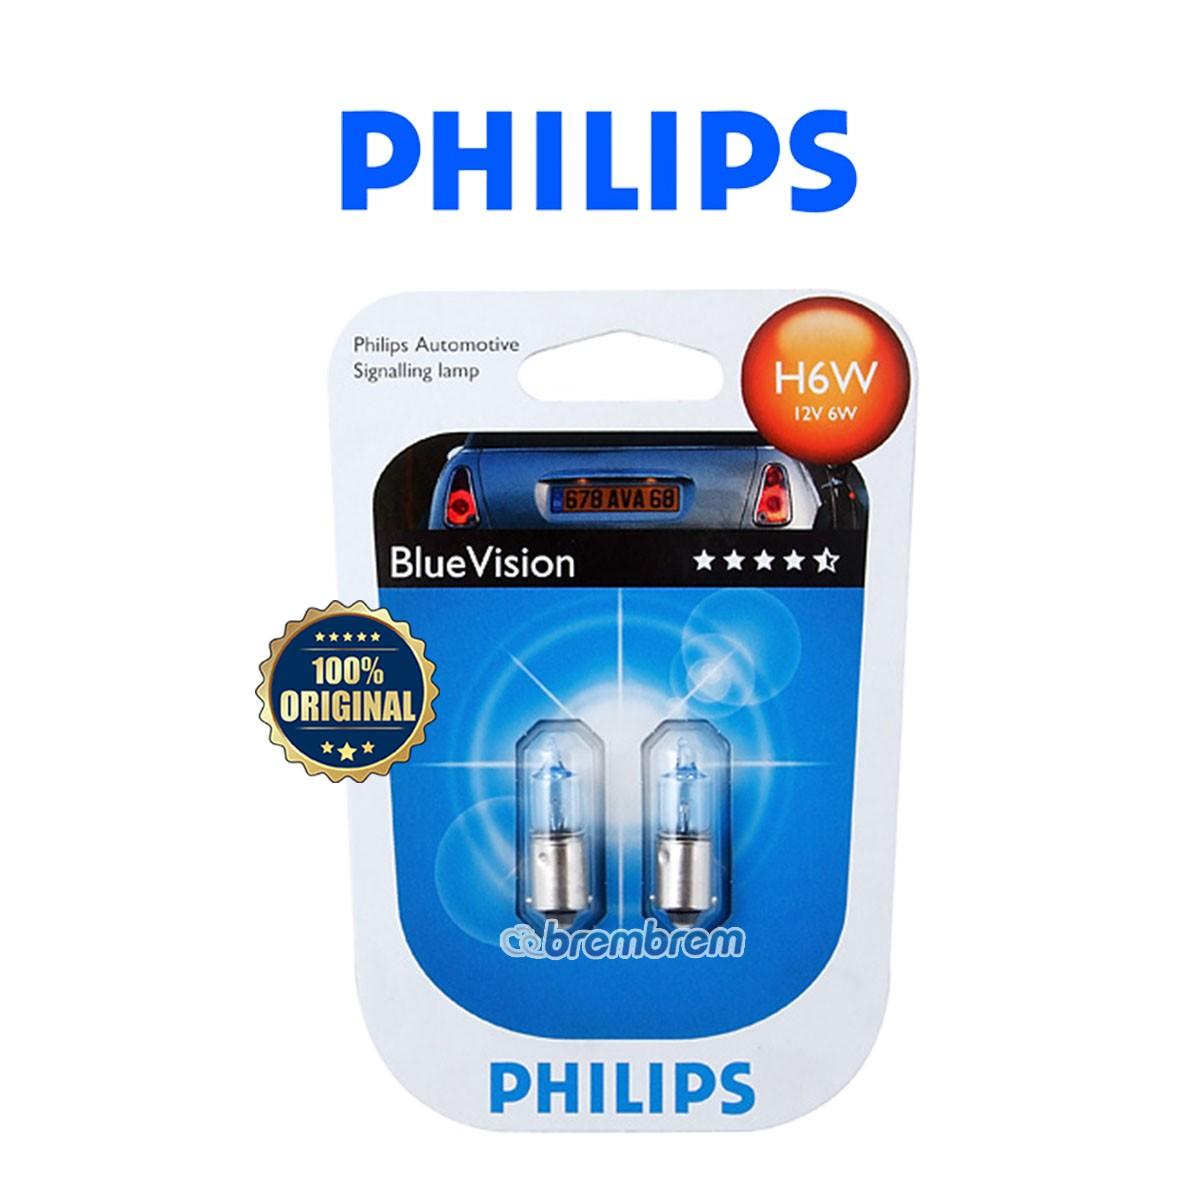 PHILIPS BLUE VISION H6W BV (4000K) - LAMPU HALOGEN